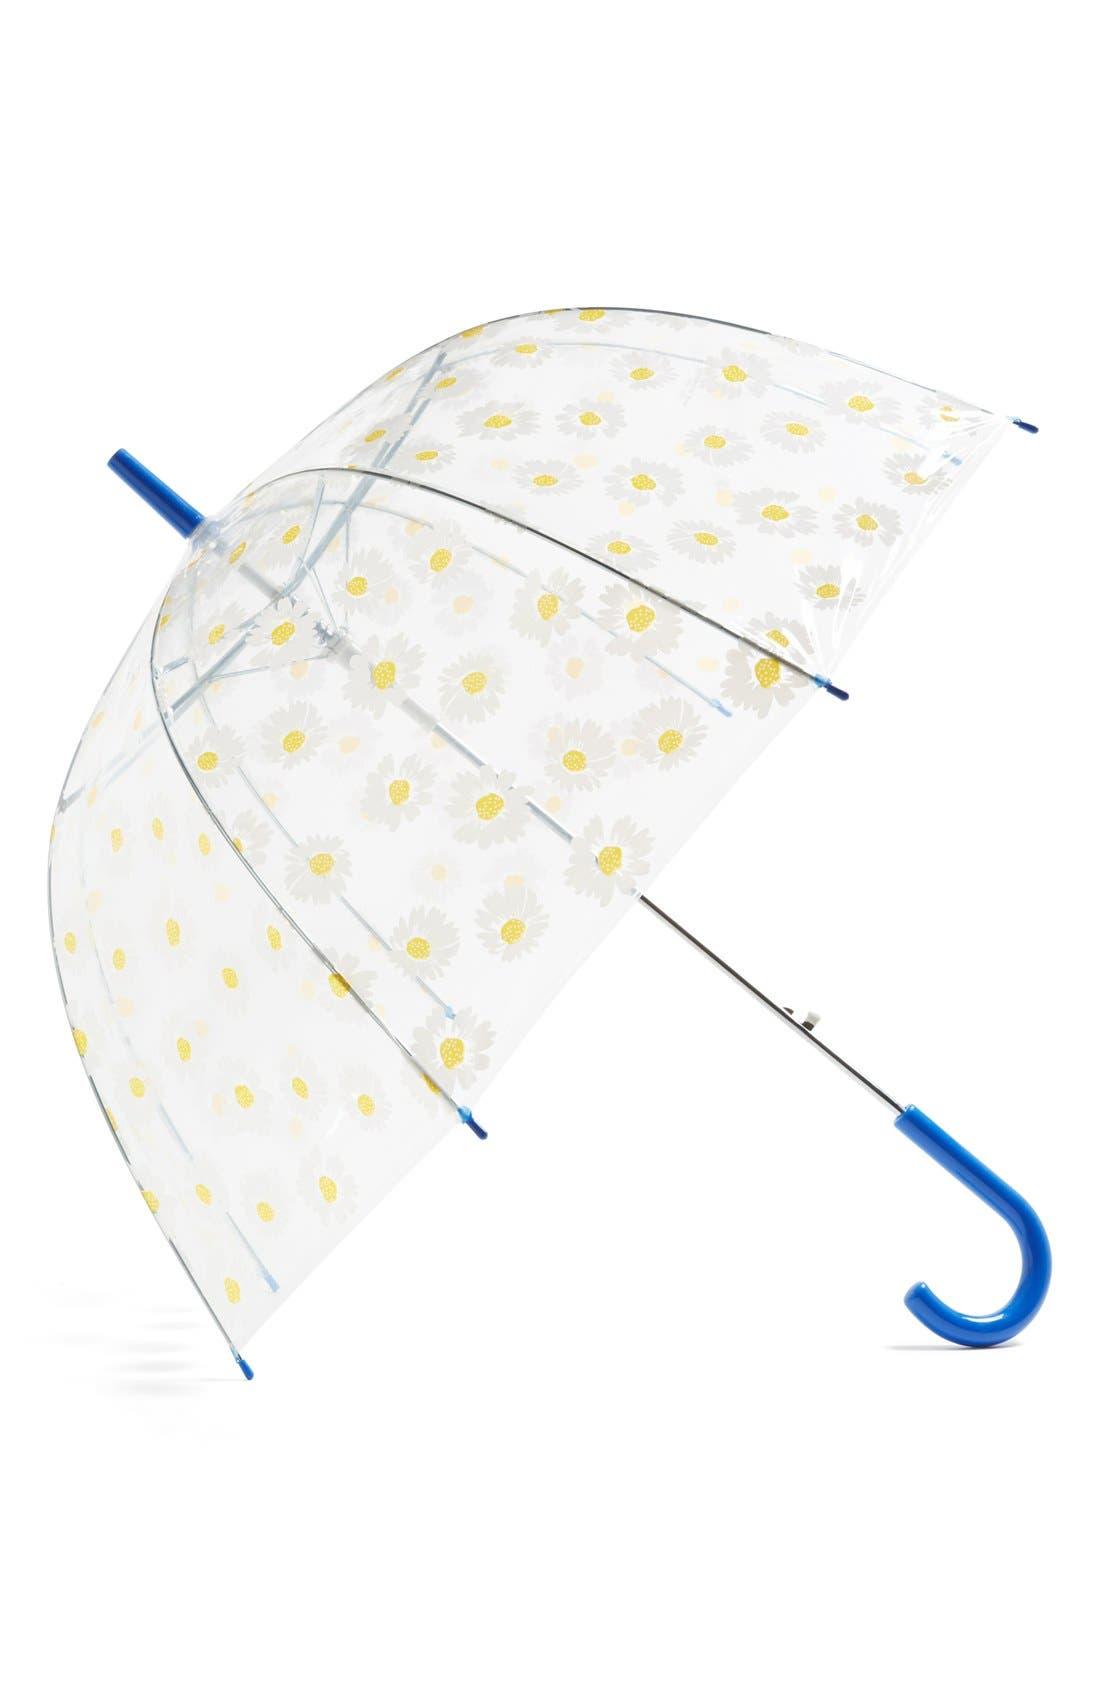 Alternate Image 1 Selected - Tri-Coastal Design Daisy Dome Umbrella (Juniors) (Online Only)